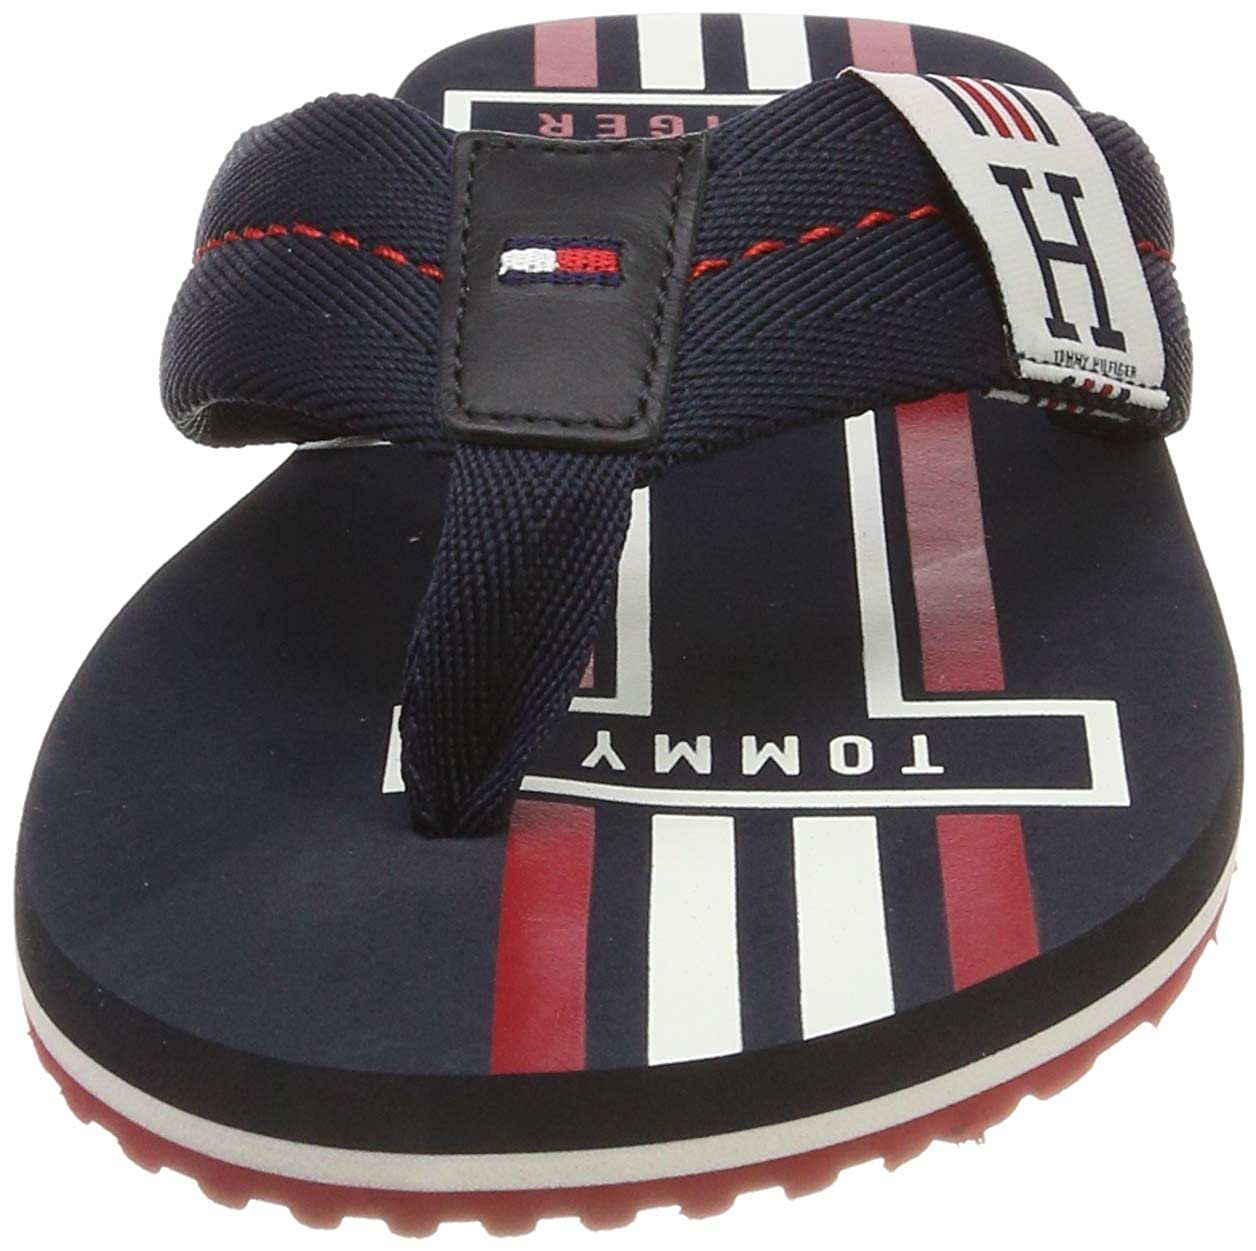 Tommy Hilfiger Badge Textile Mens Beach Sandals